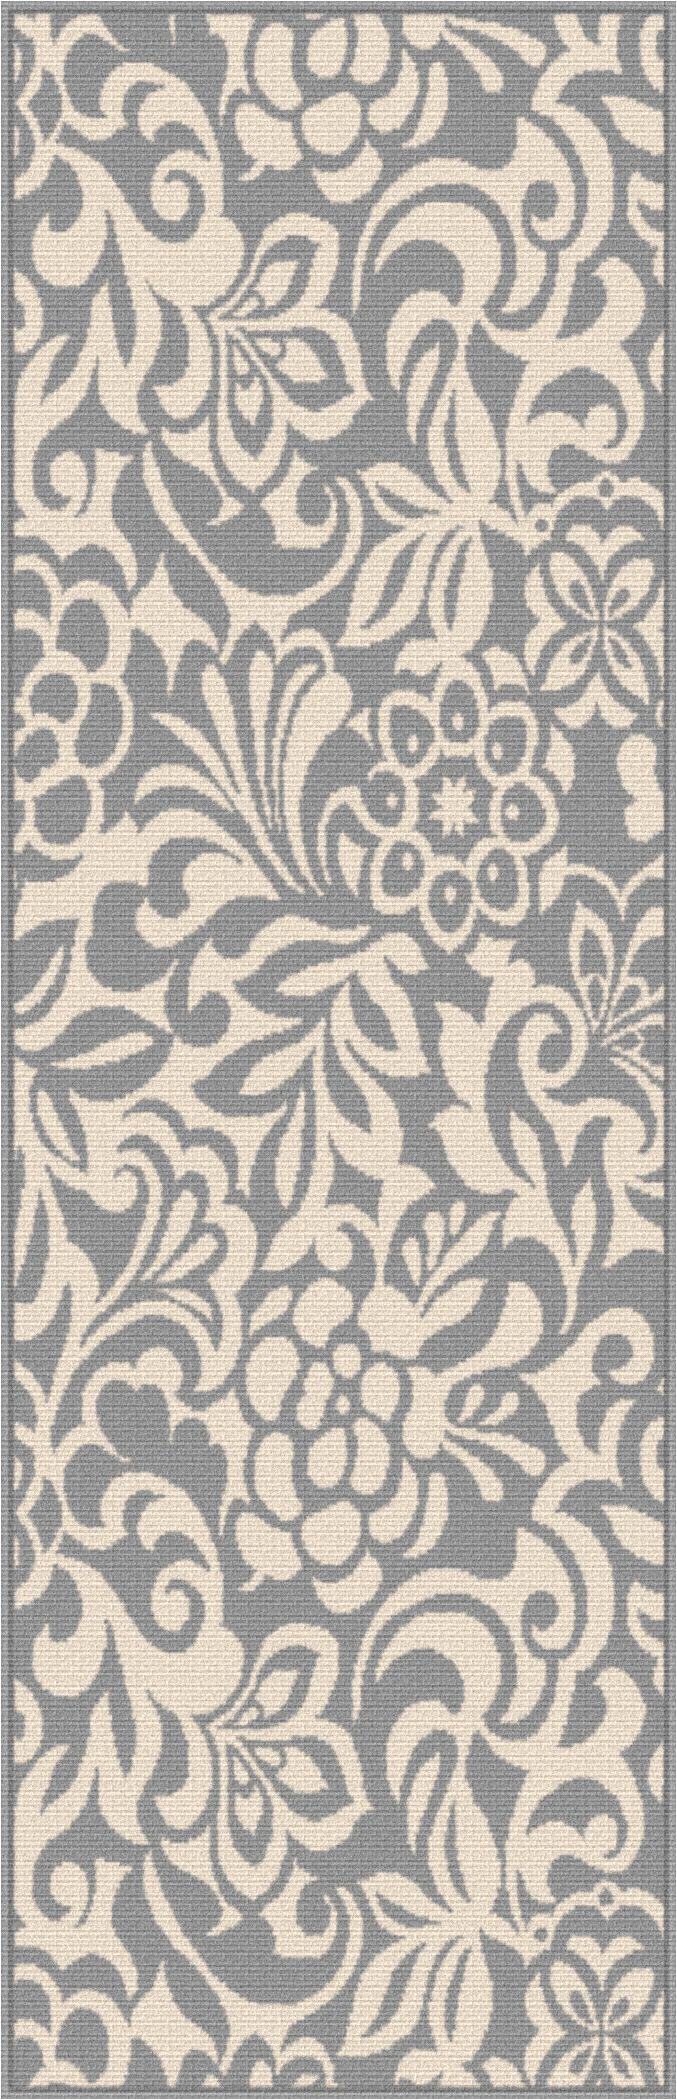 tayse rugs garden city tahari floral runner x gray